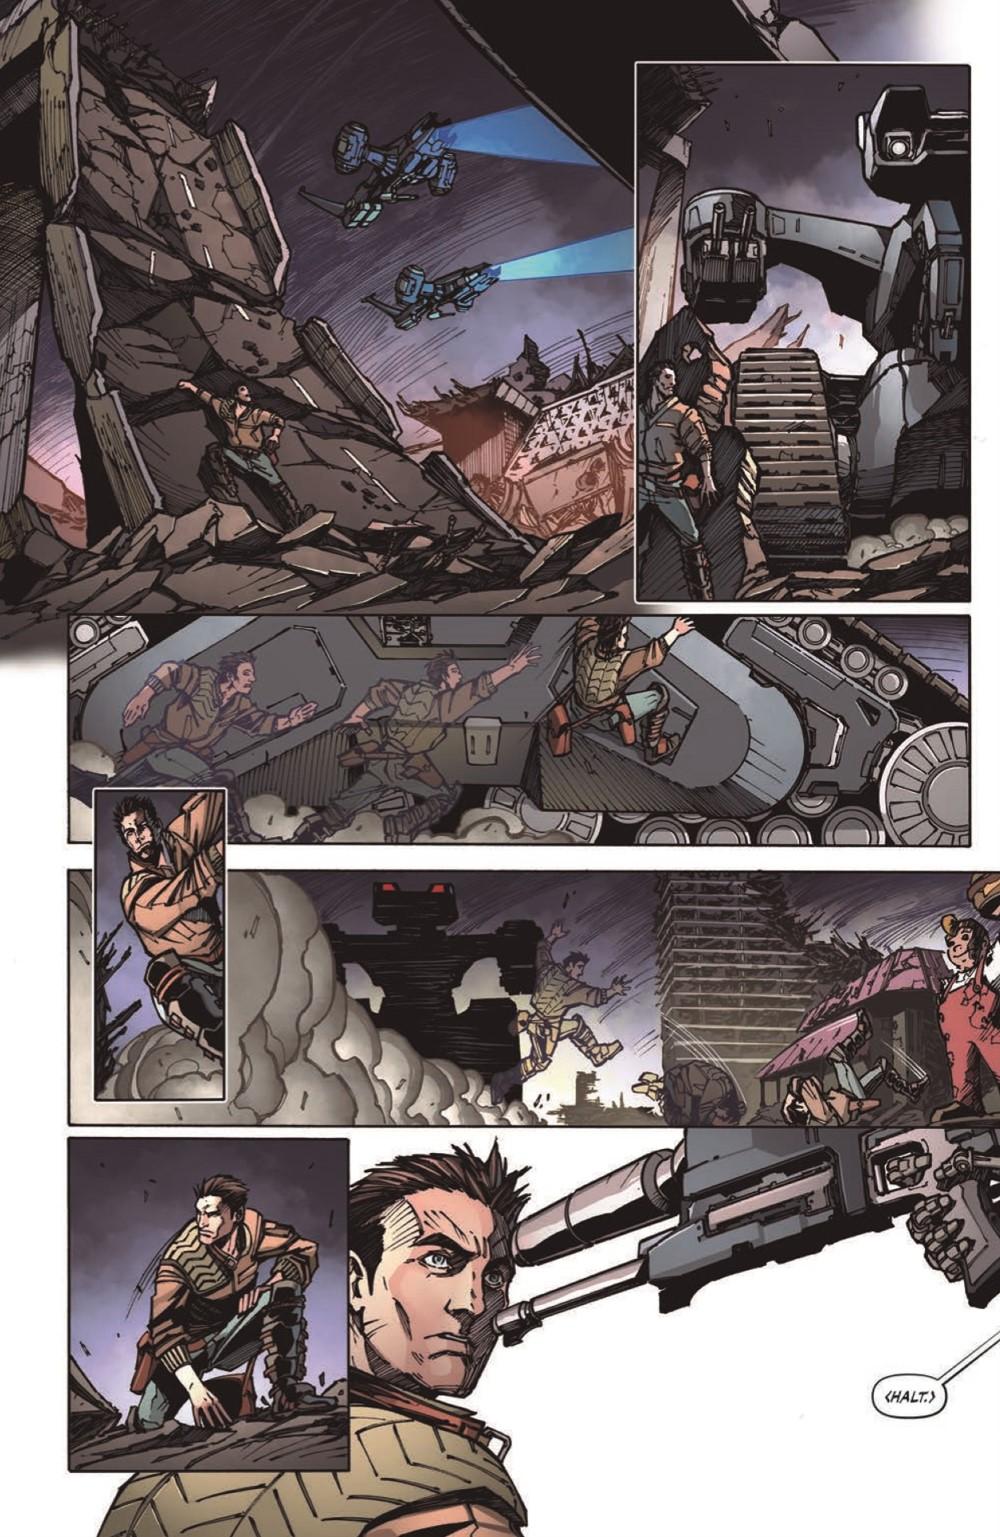 TF-vs-TERMINATOR-pr-6 ComicList Previews: TRANSFORMERS VS THE TERMINATOR ENEMY OF MY ENEMY TP